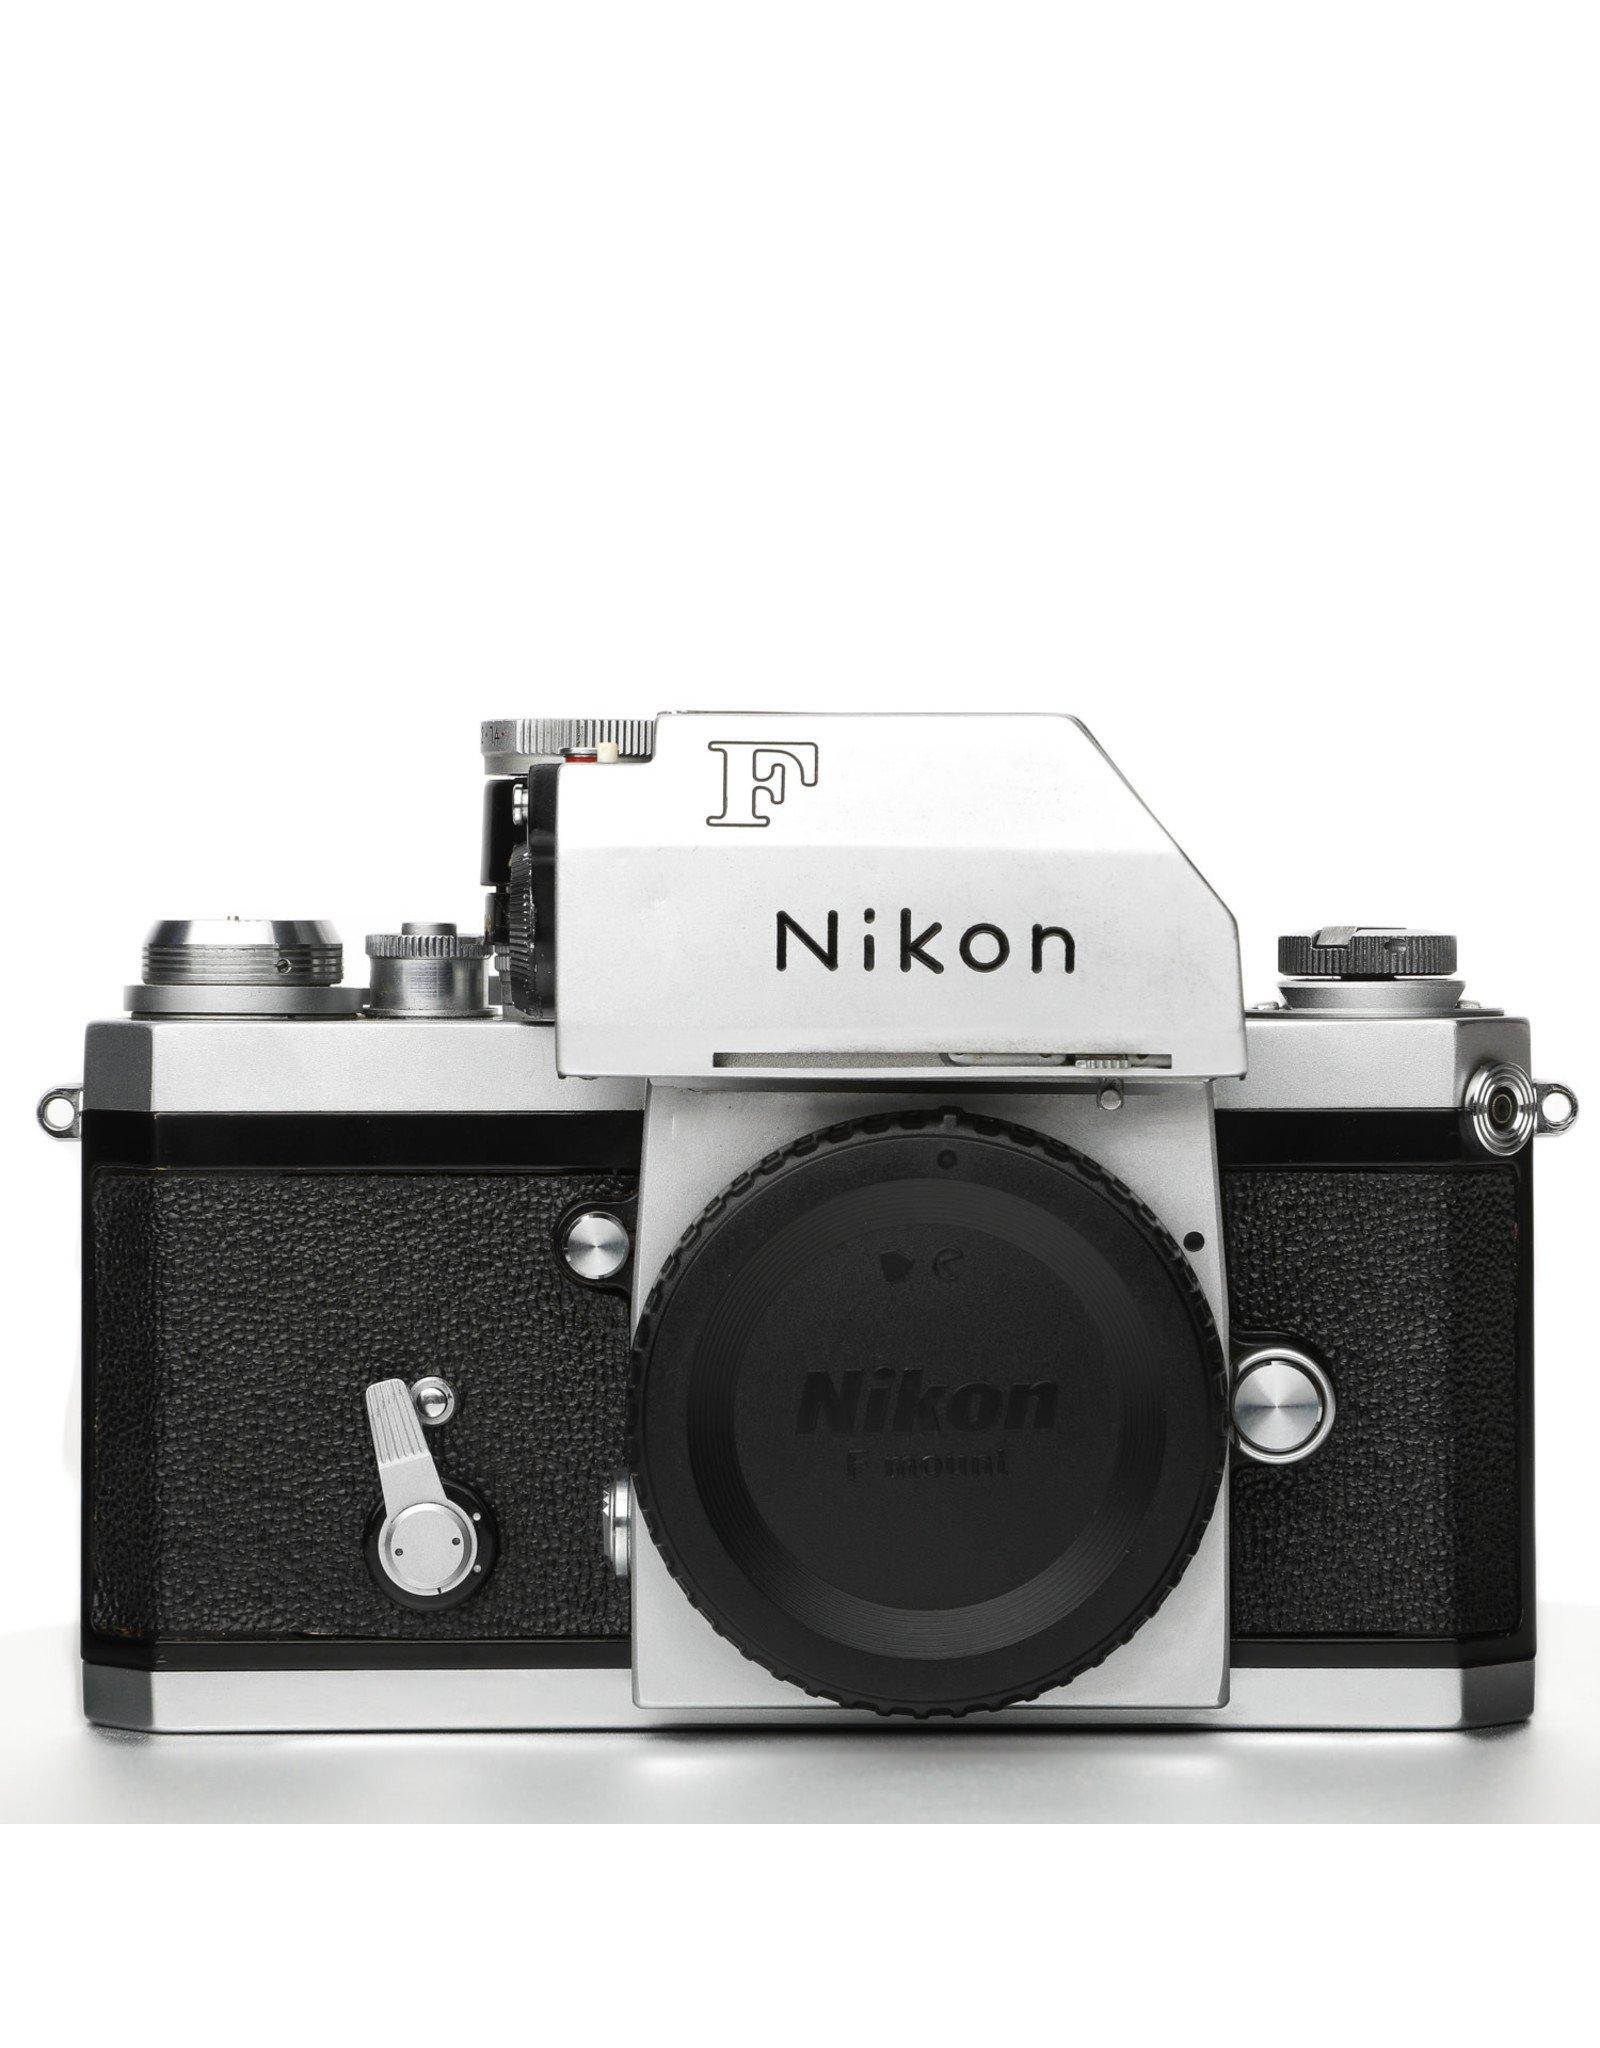 Nikon Nikon F 35mm Camera w/Photomic Prism Finder